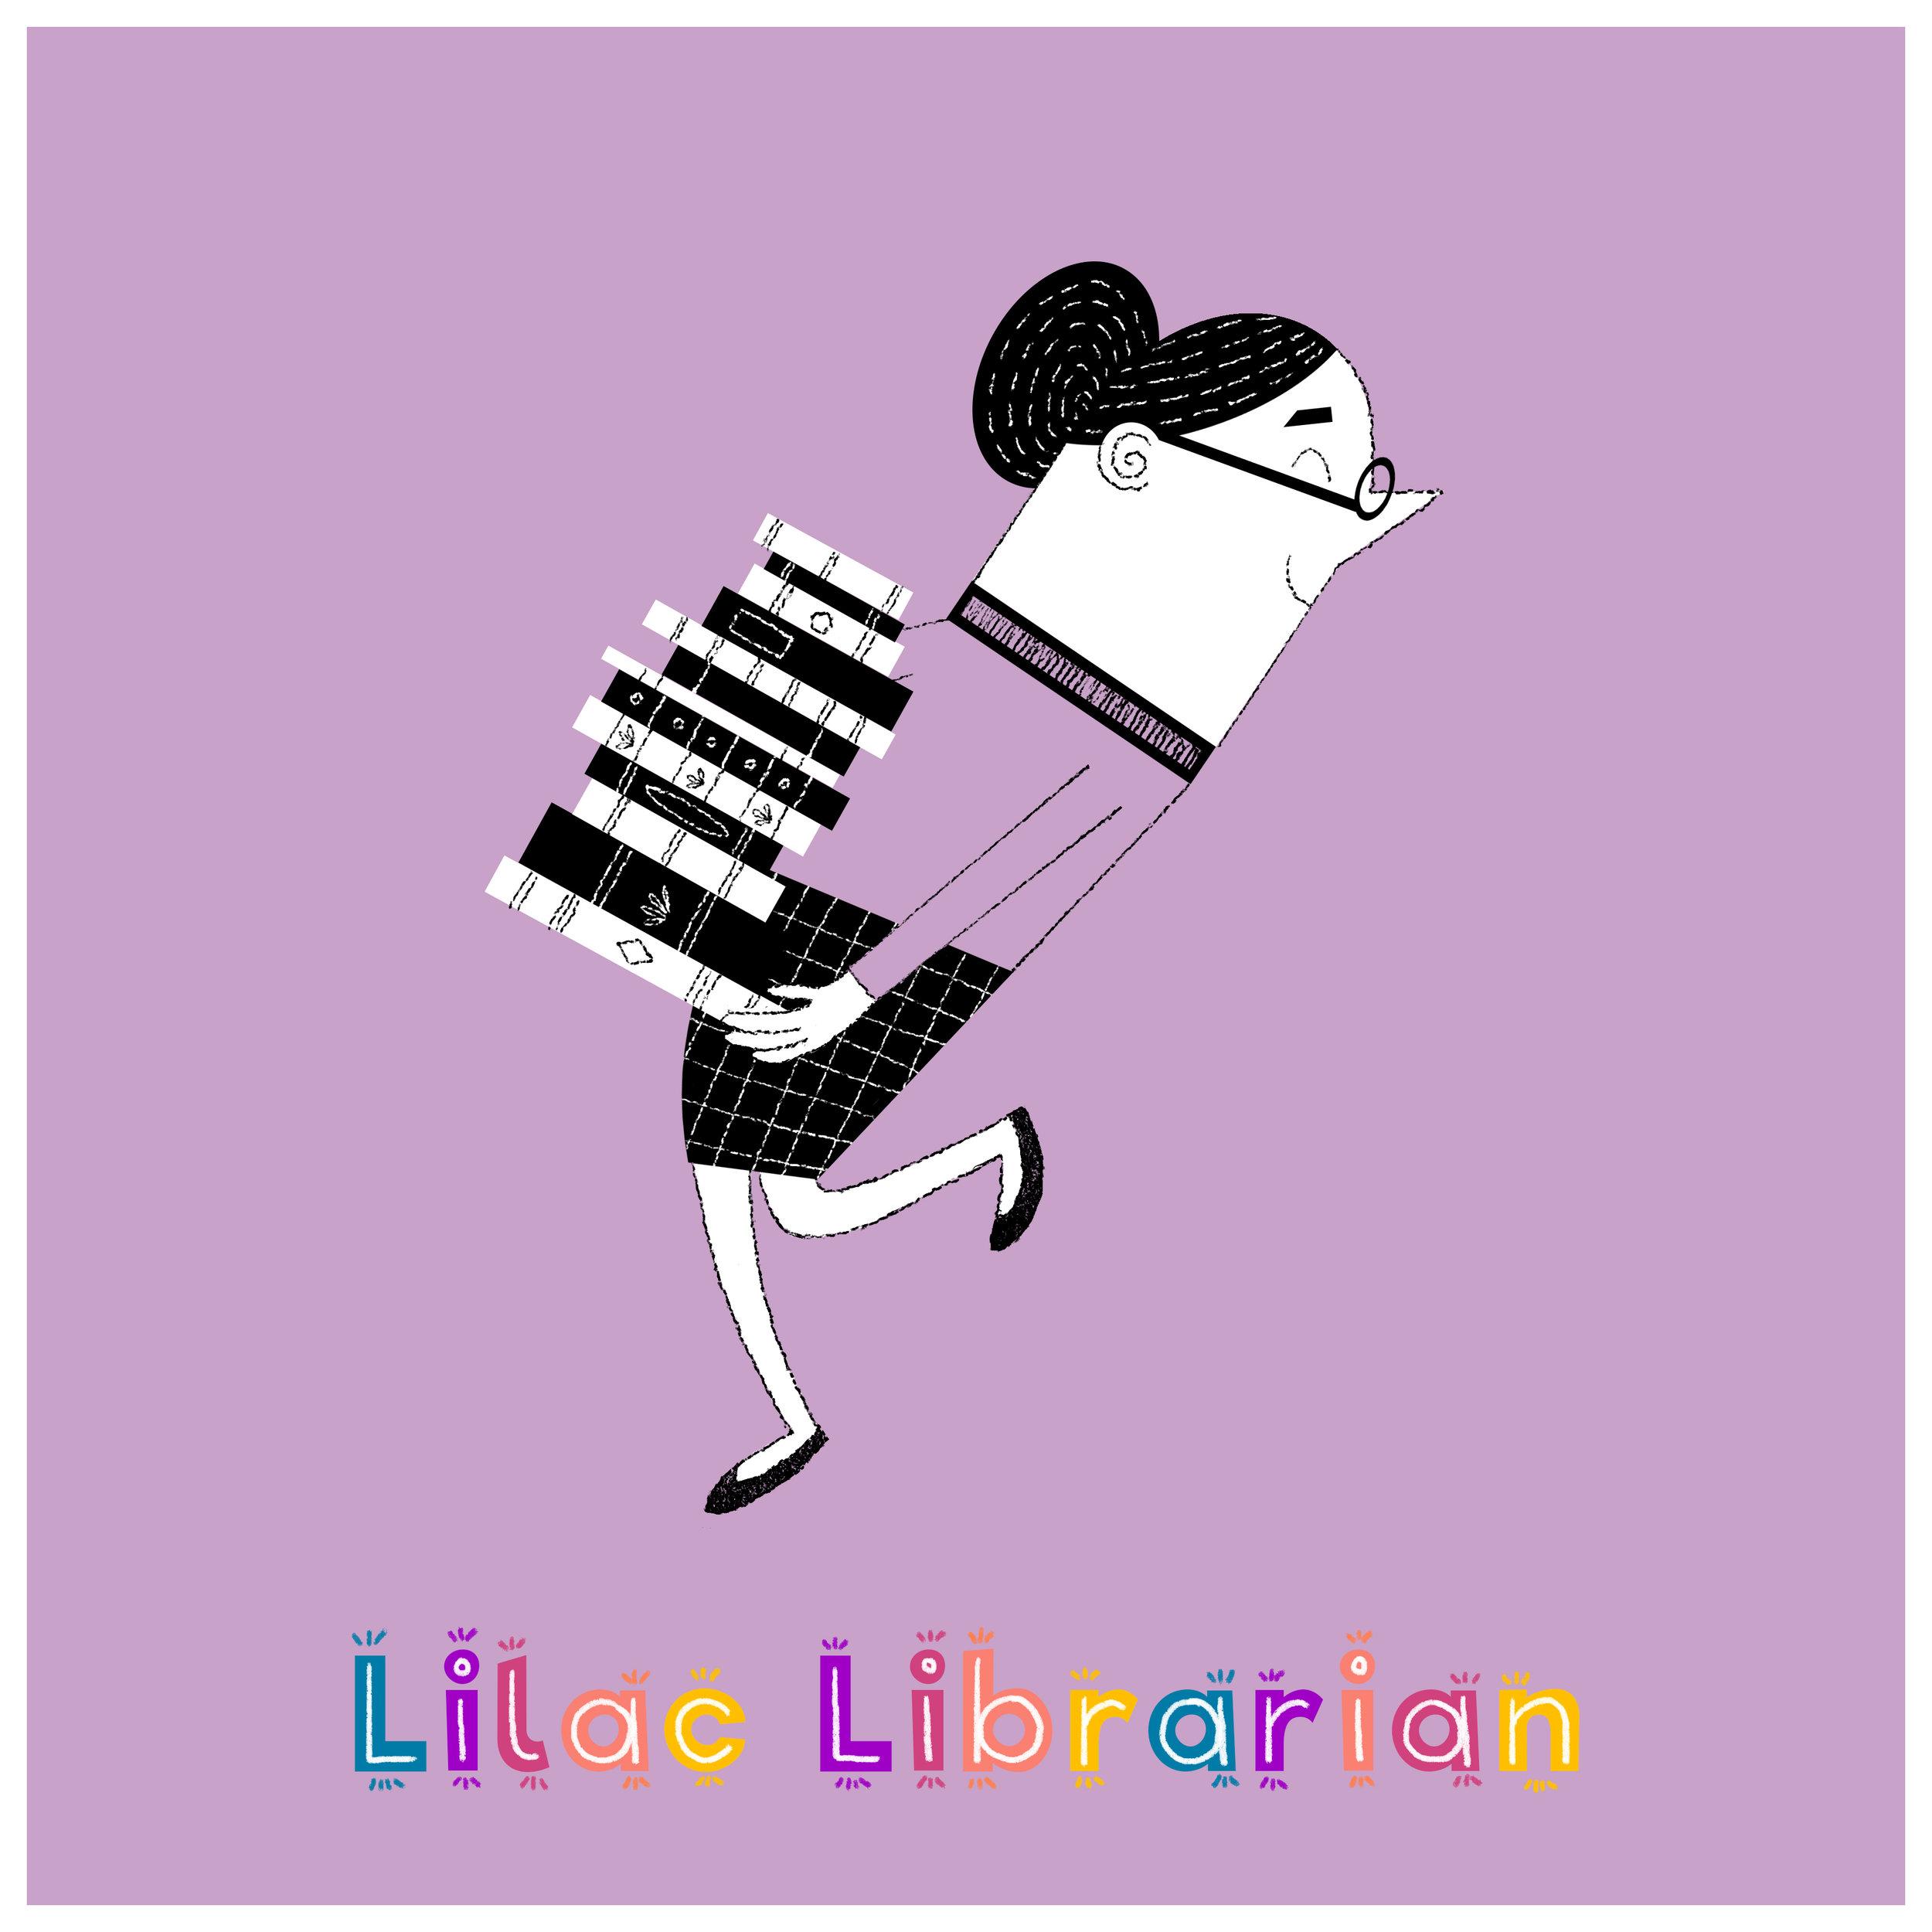 Art_Memory_Game_Cards_Lilac_Librarian.jpg